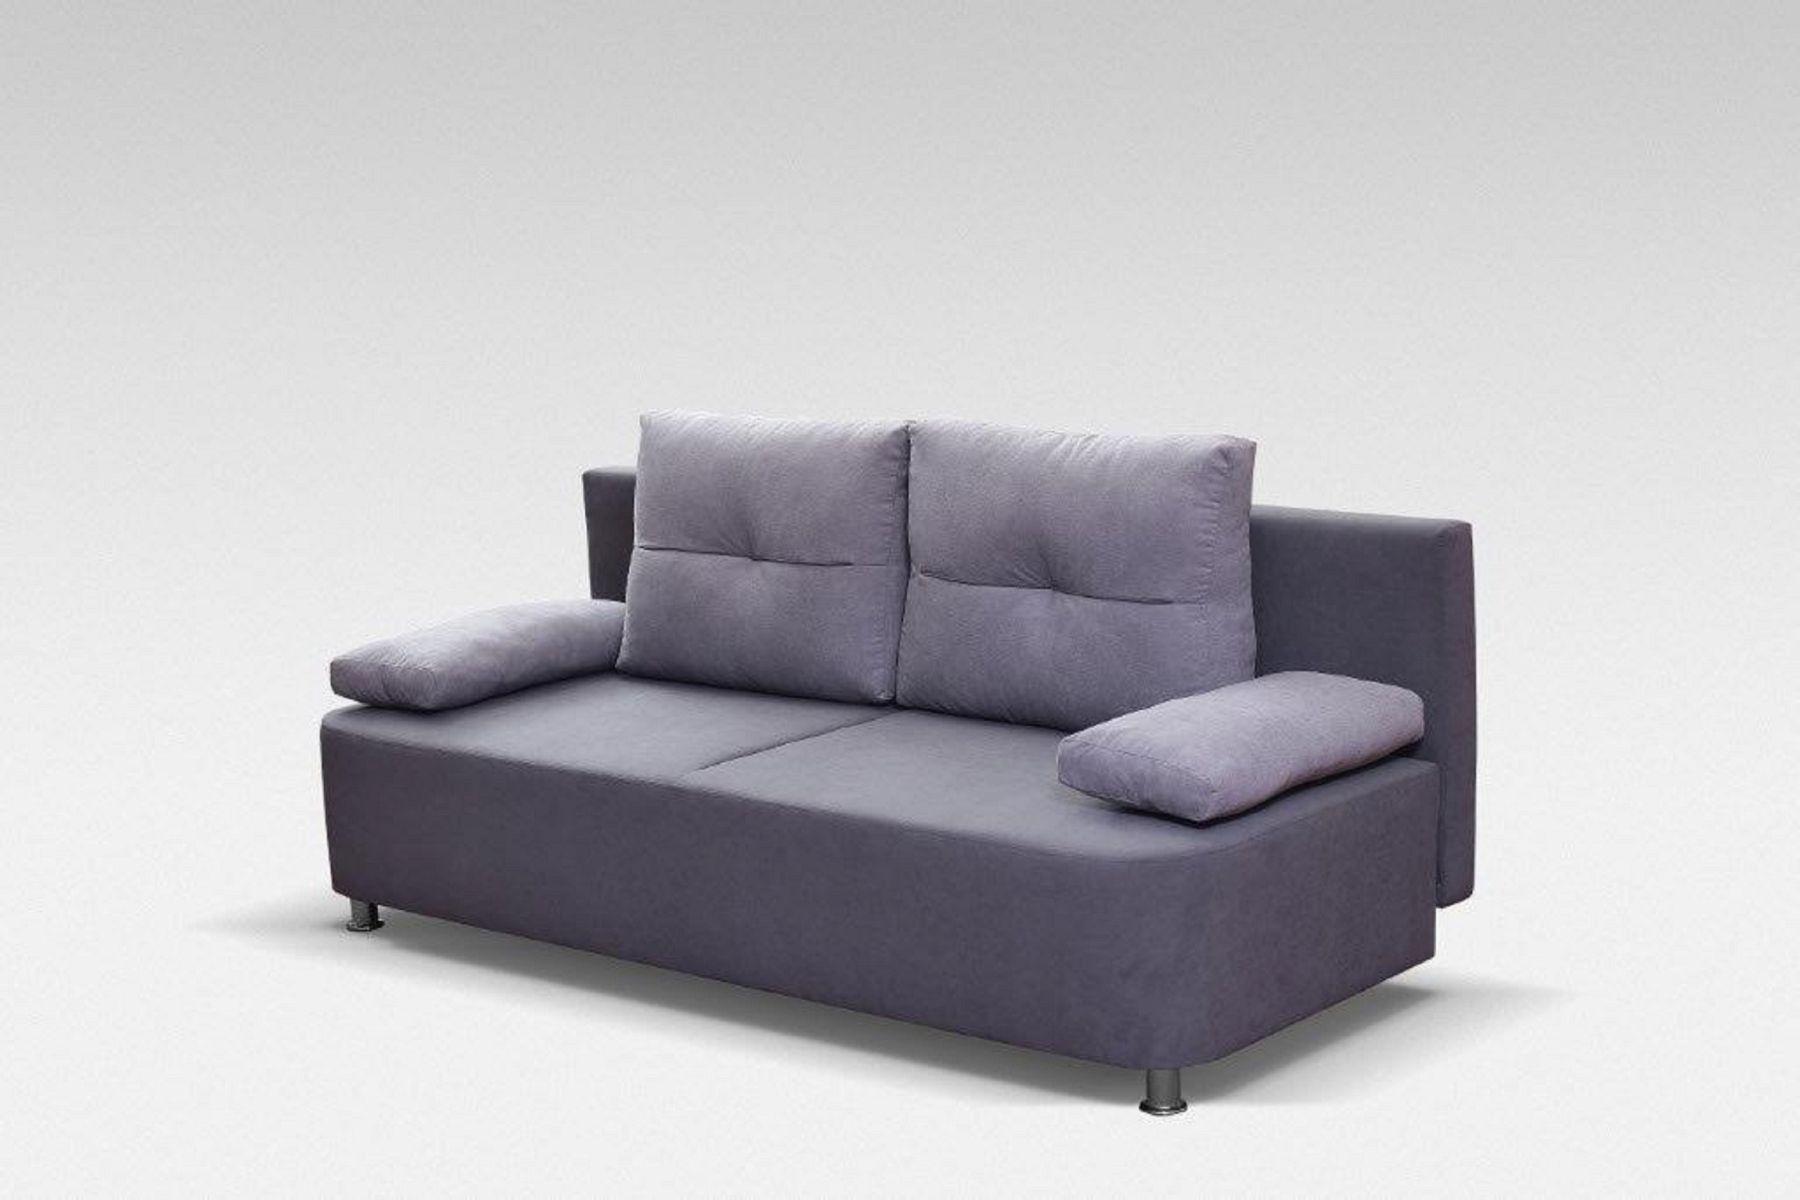 schlafsofa faro funktionssofas wohnzimmer sortiment. Black Bedroom Furniture Sets. Home Design Ideas